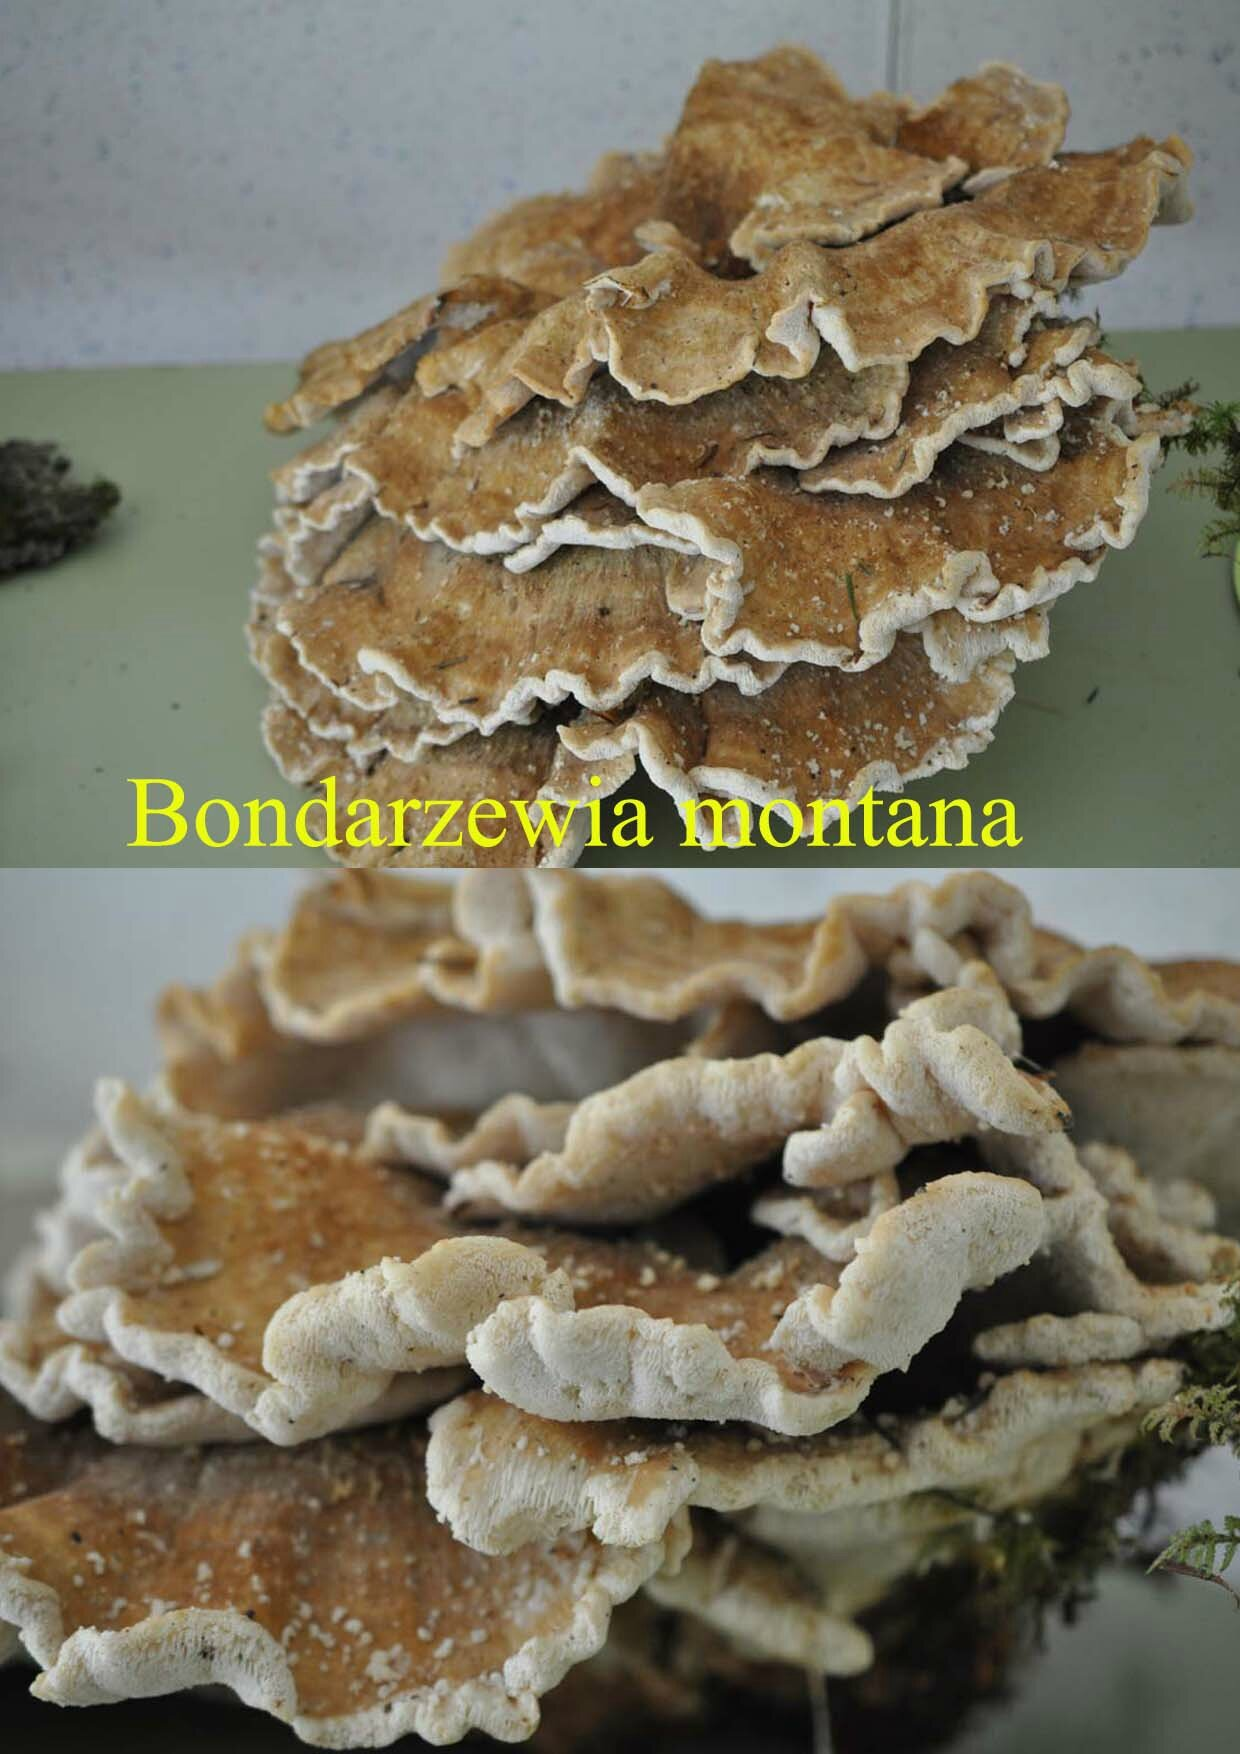 Bondarzewia montana